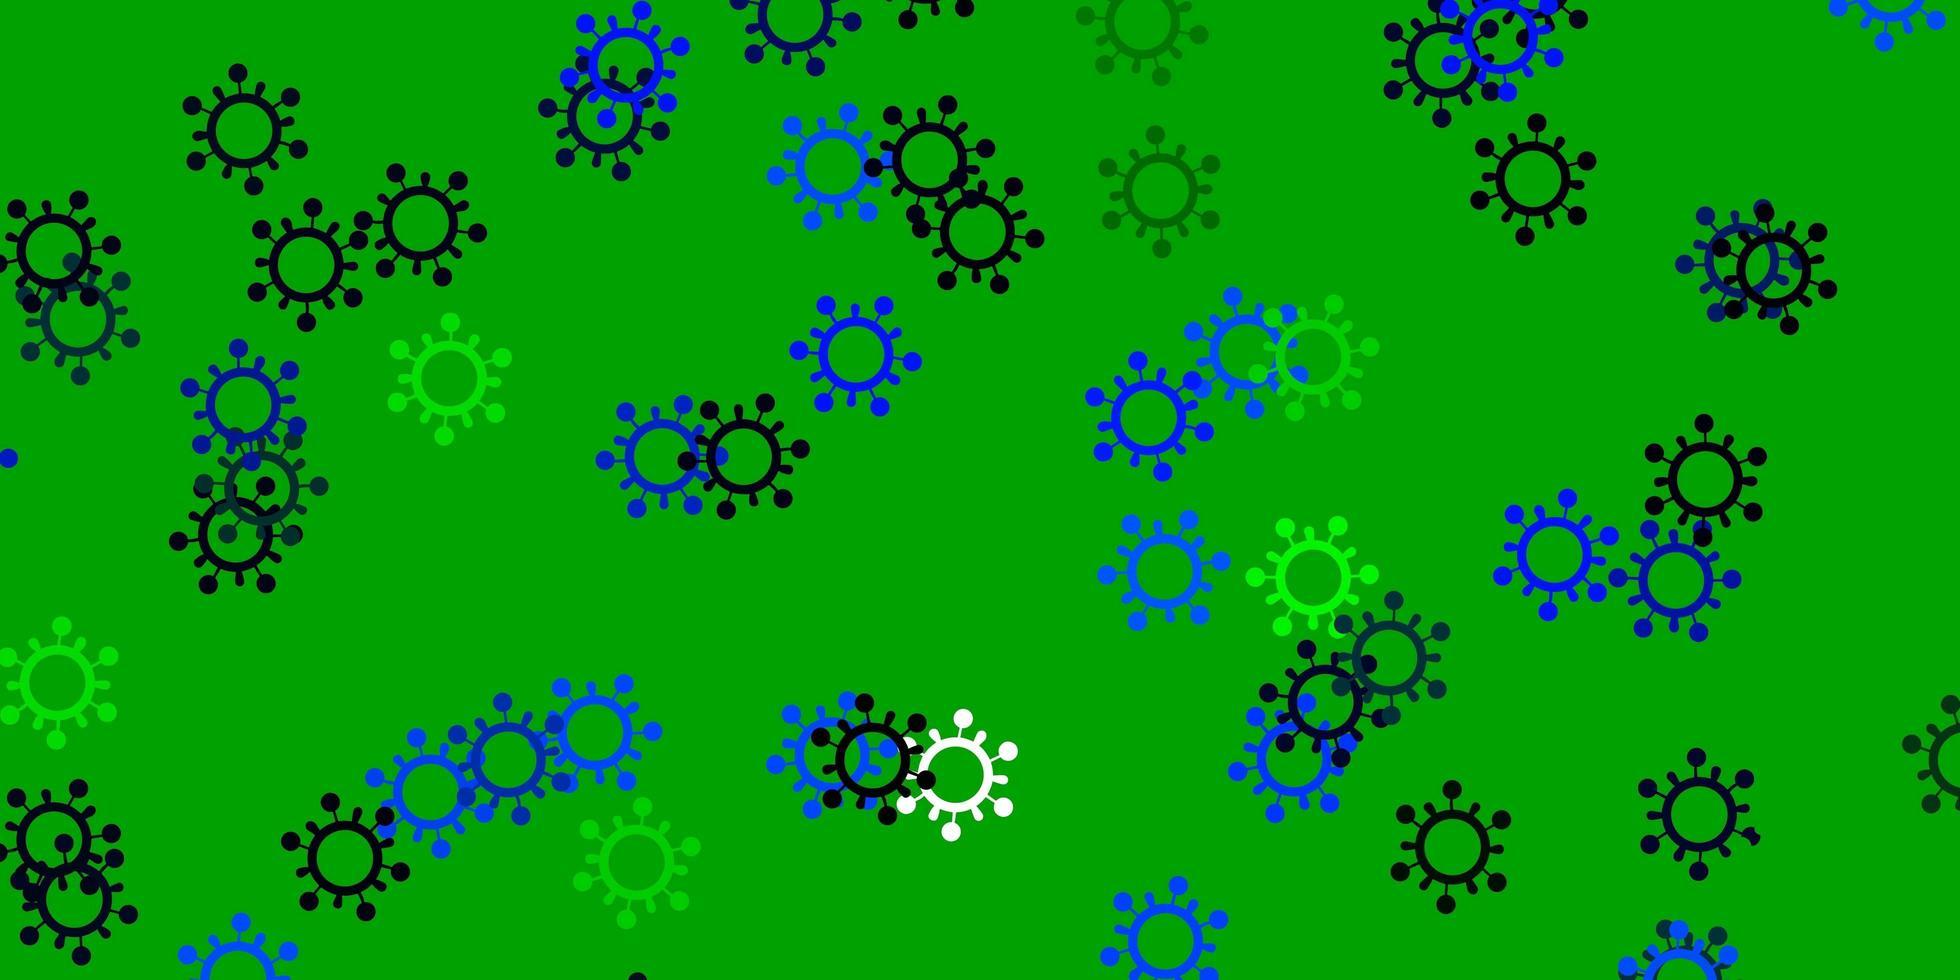 plantilla de vector azul claro, verde con signos de gripe